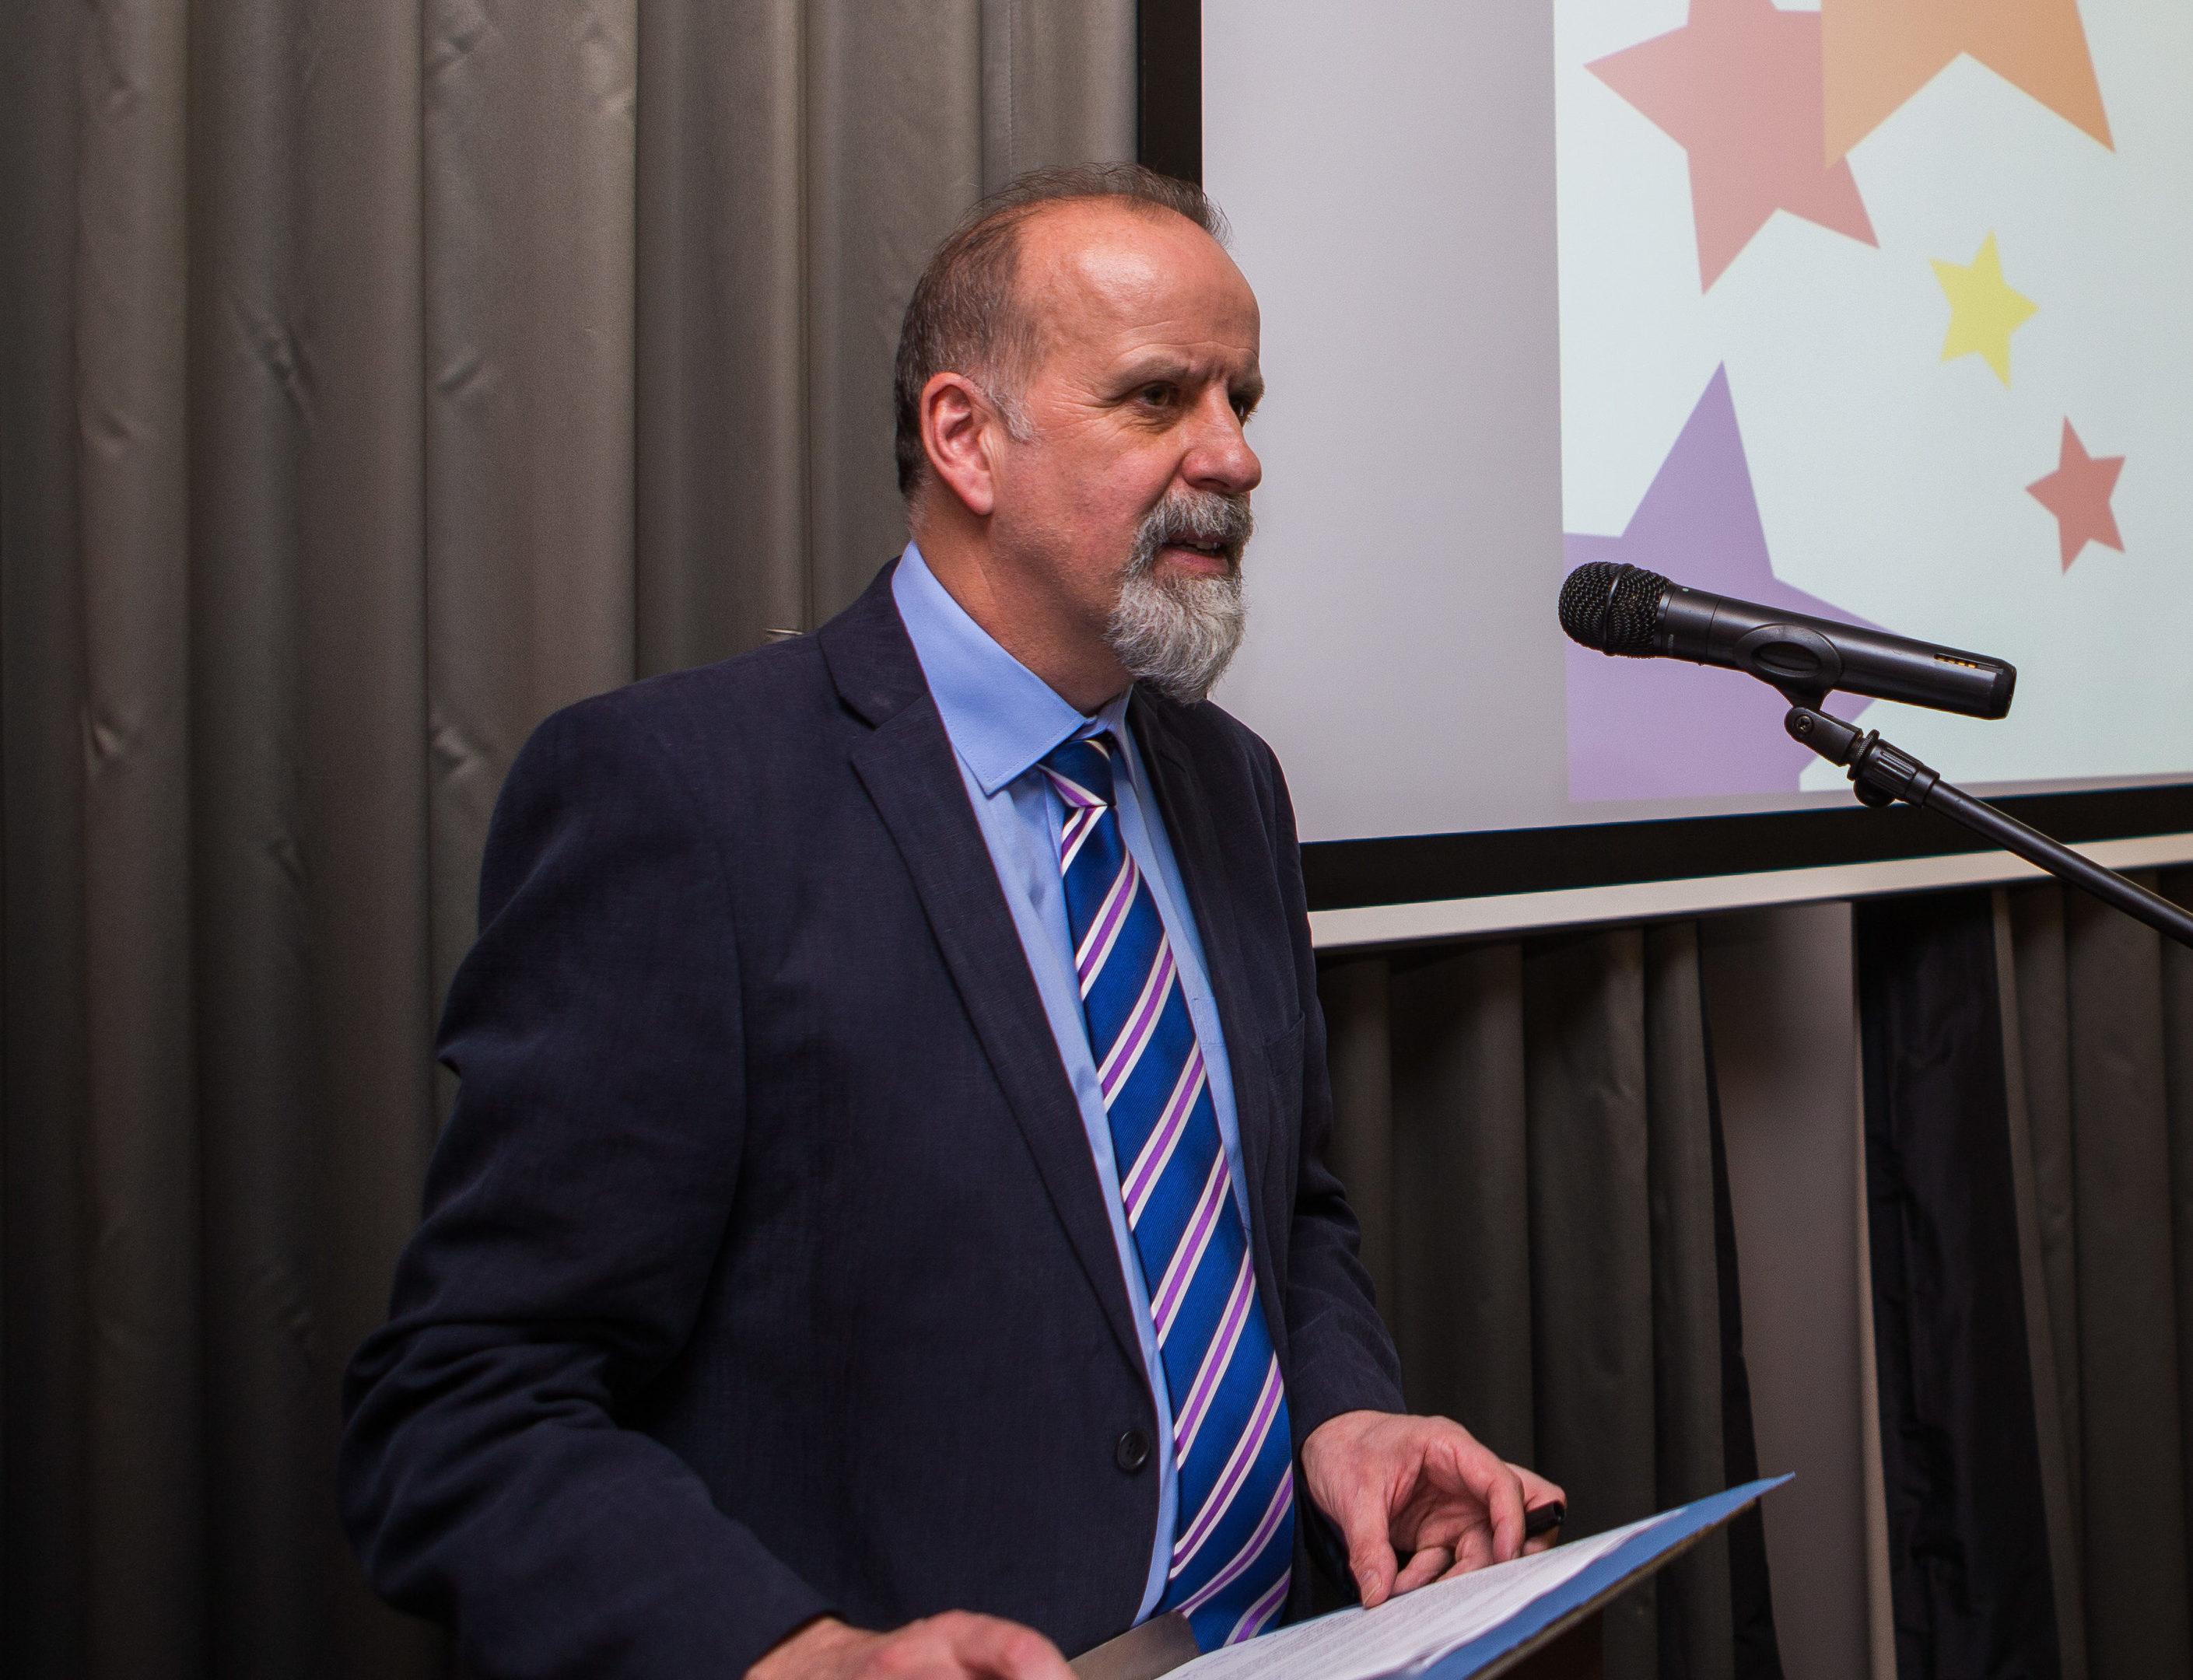 Chief Executive of Volunteer Dundee, Eric Knox